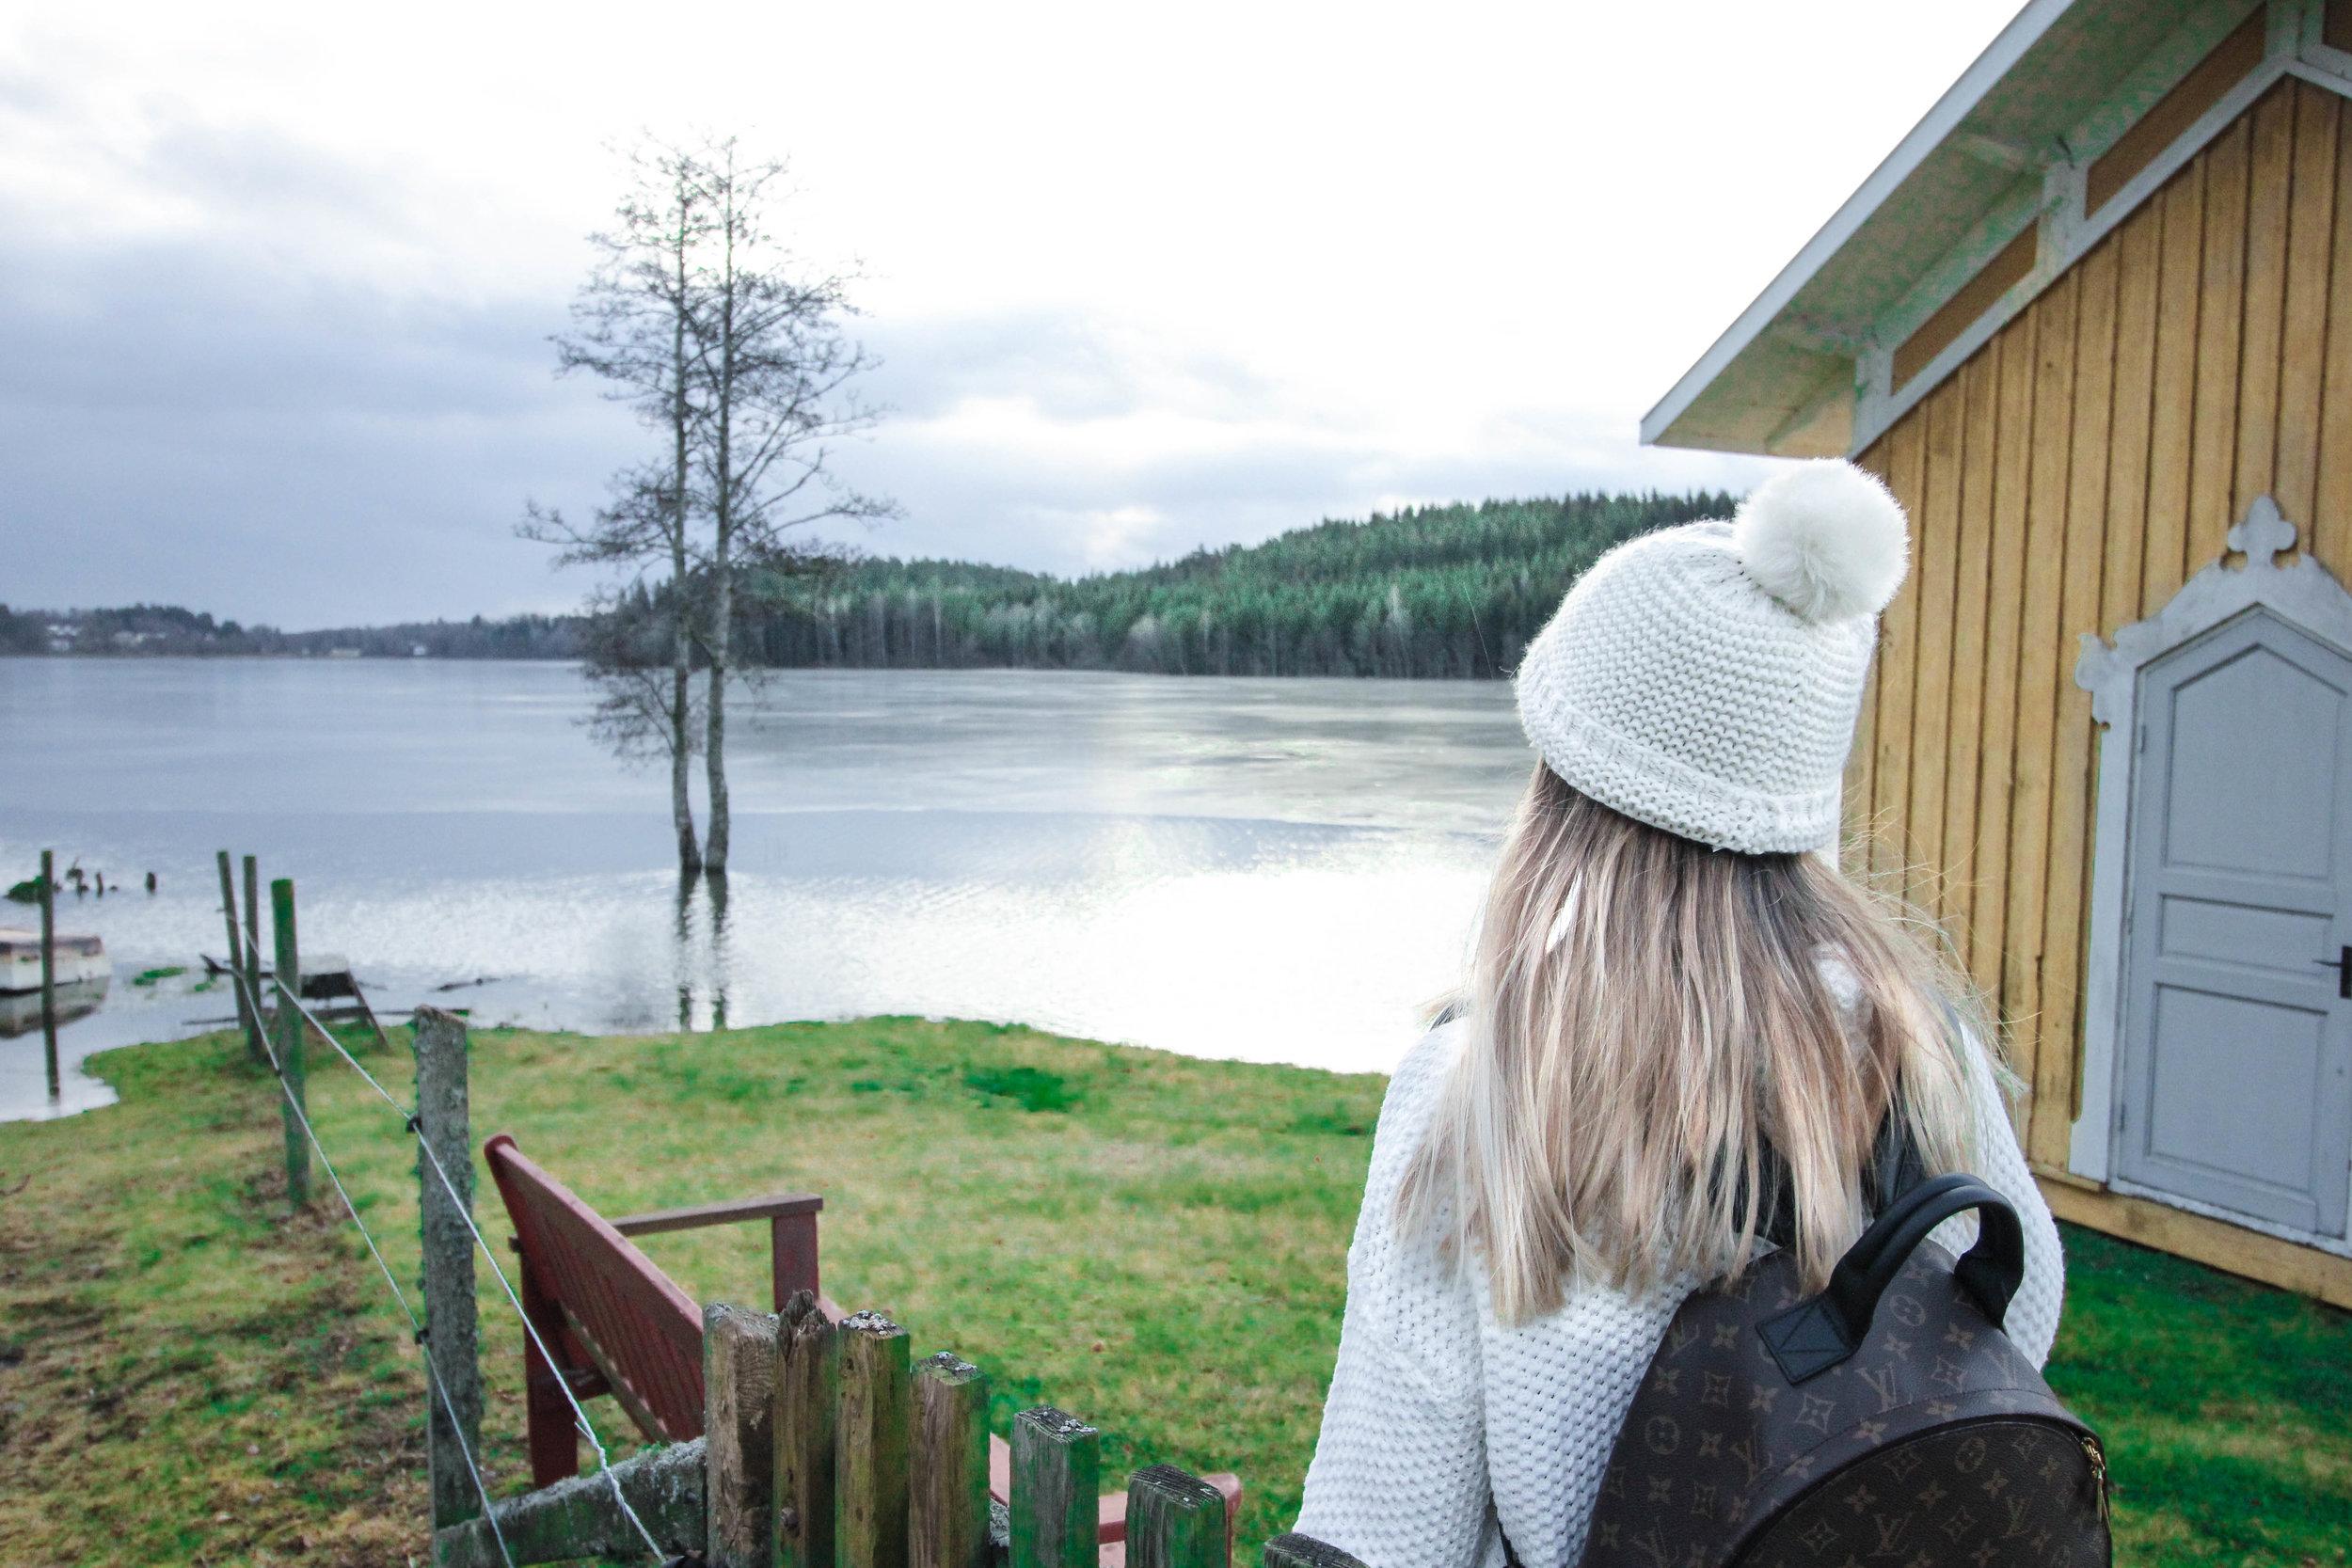 Overlooking the beautiful lake